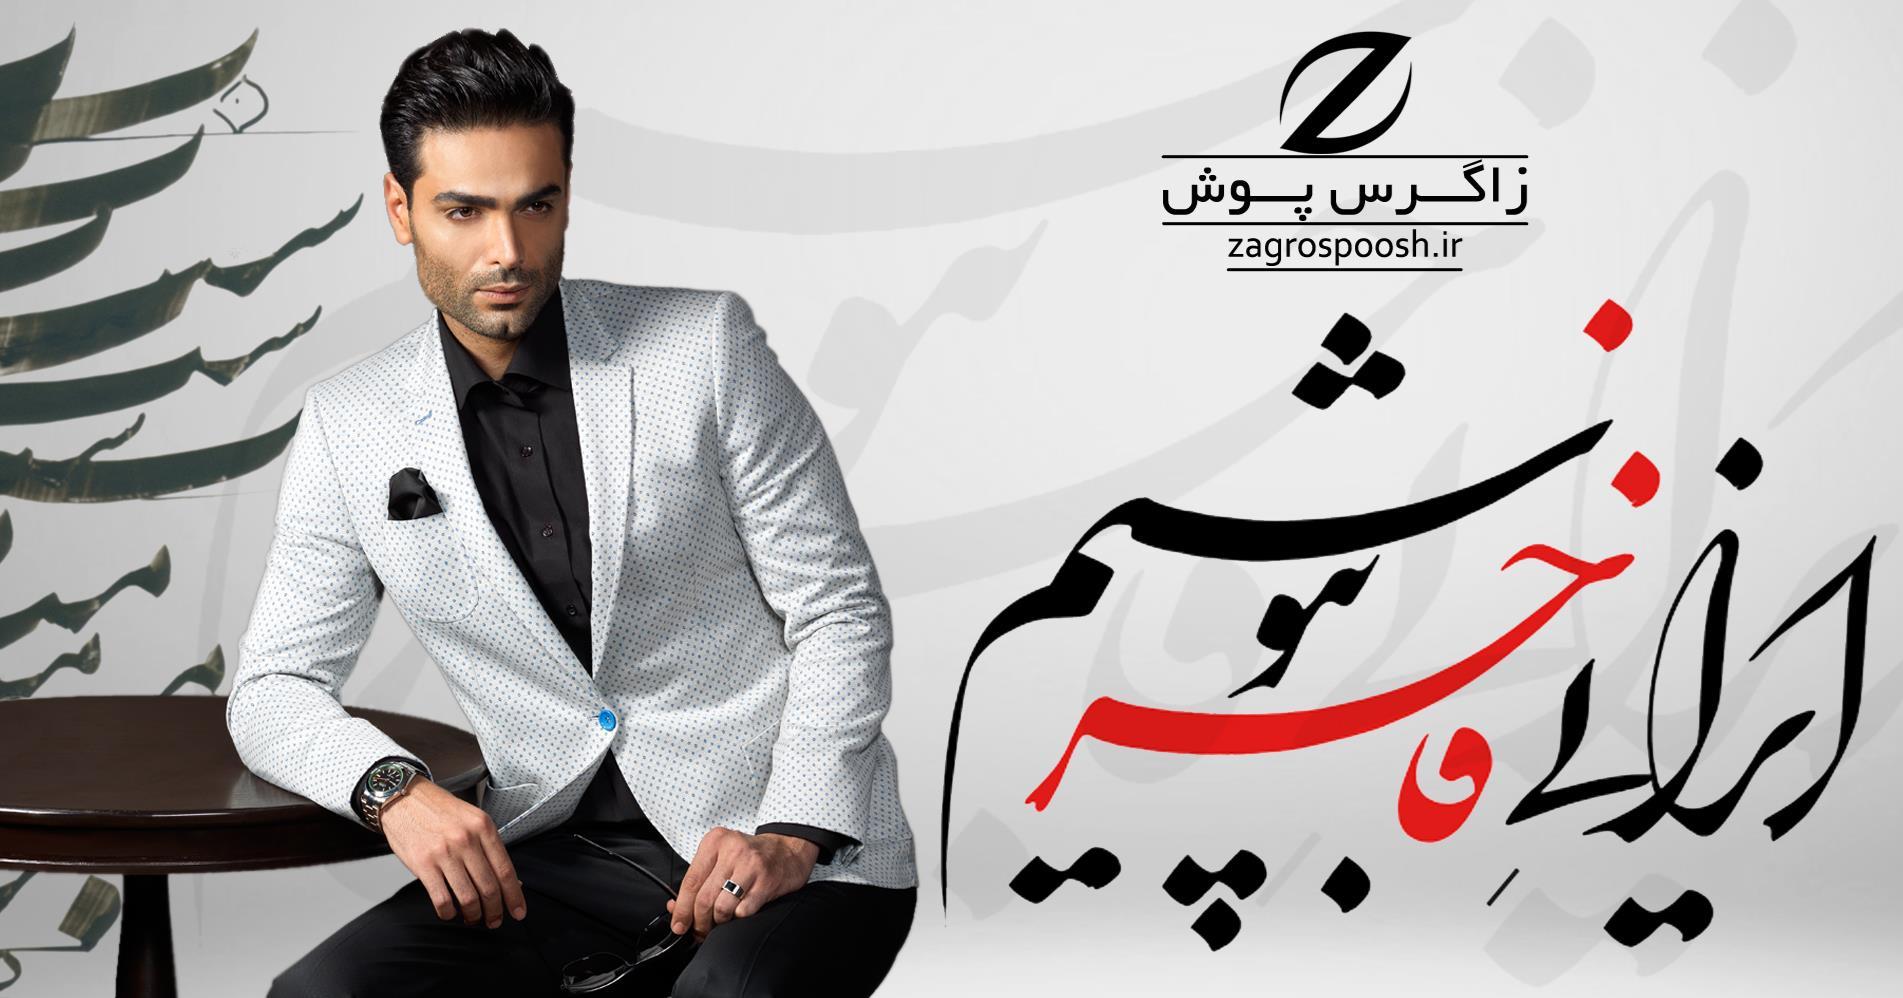 ایرانی فاخر بپوشیم. زاگرس پوش